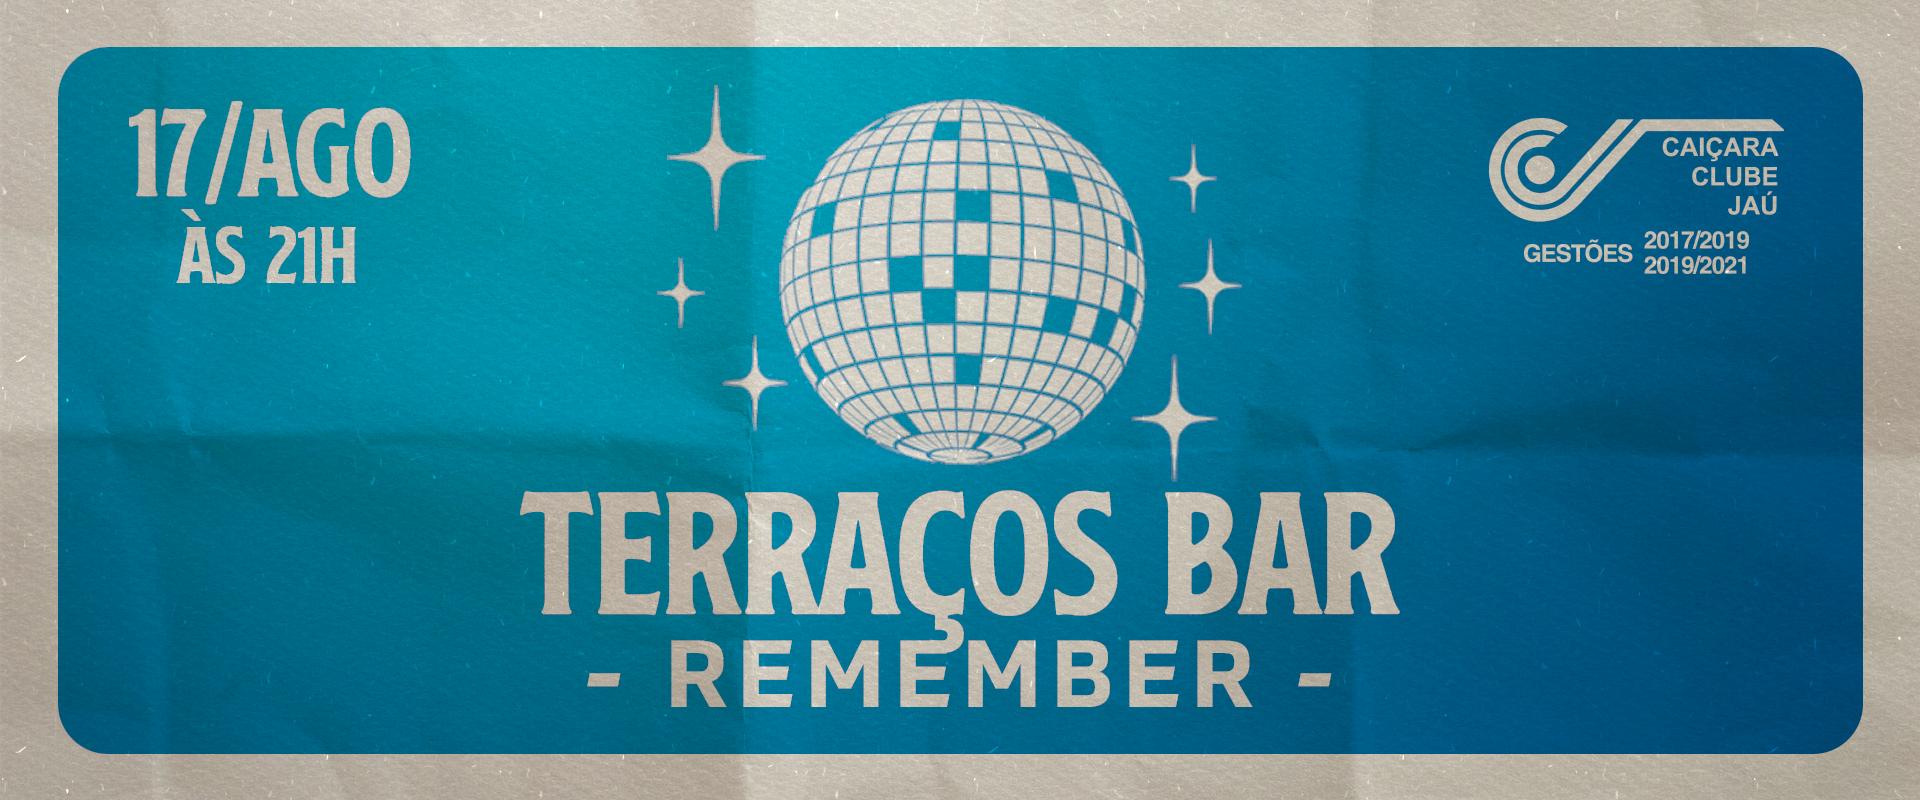 site_terracos bar_banner